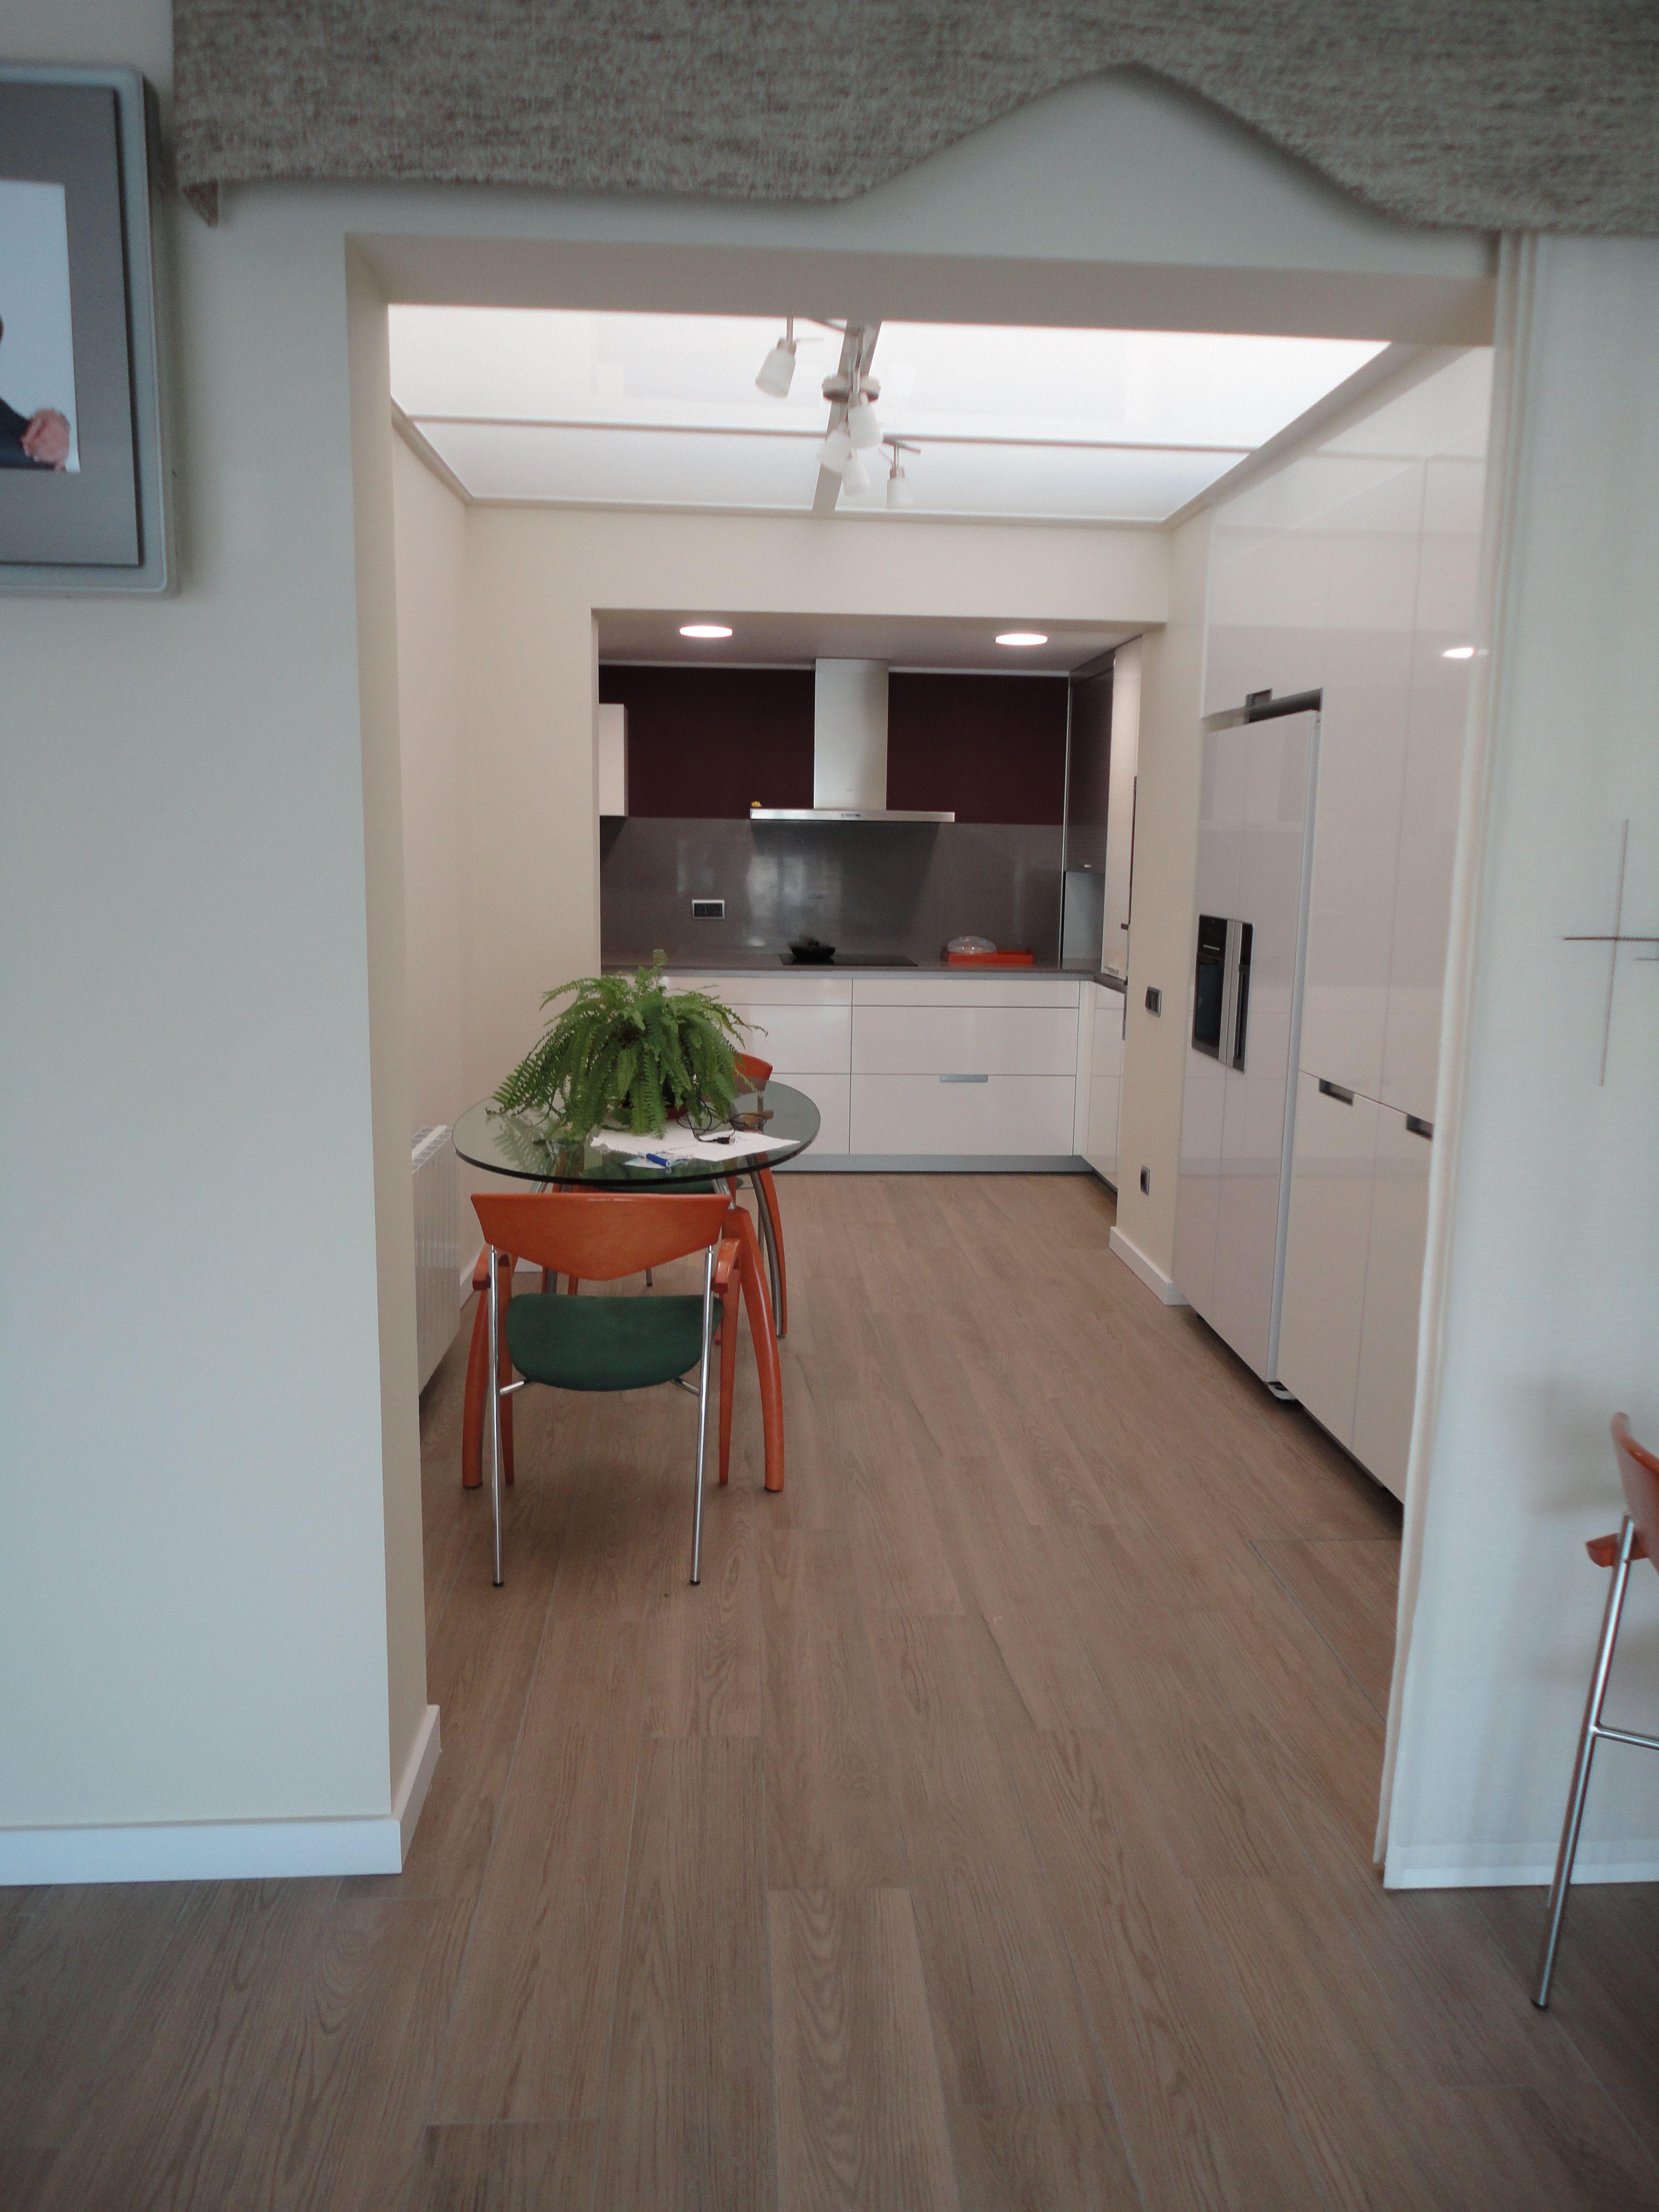 Renova Interiors Reforma Vivienda Completa M Jm Integraci N De  ~ Suelo Porcelanico Imitacion Madera Cocina